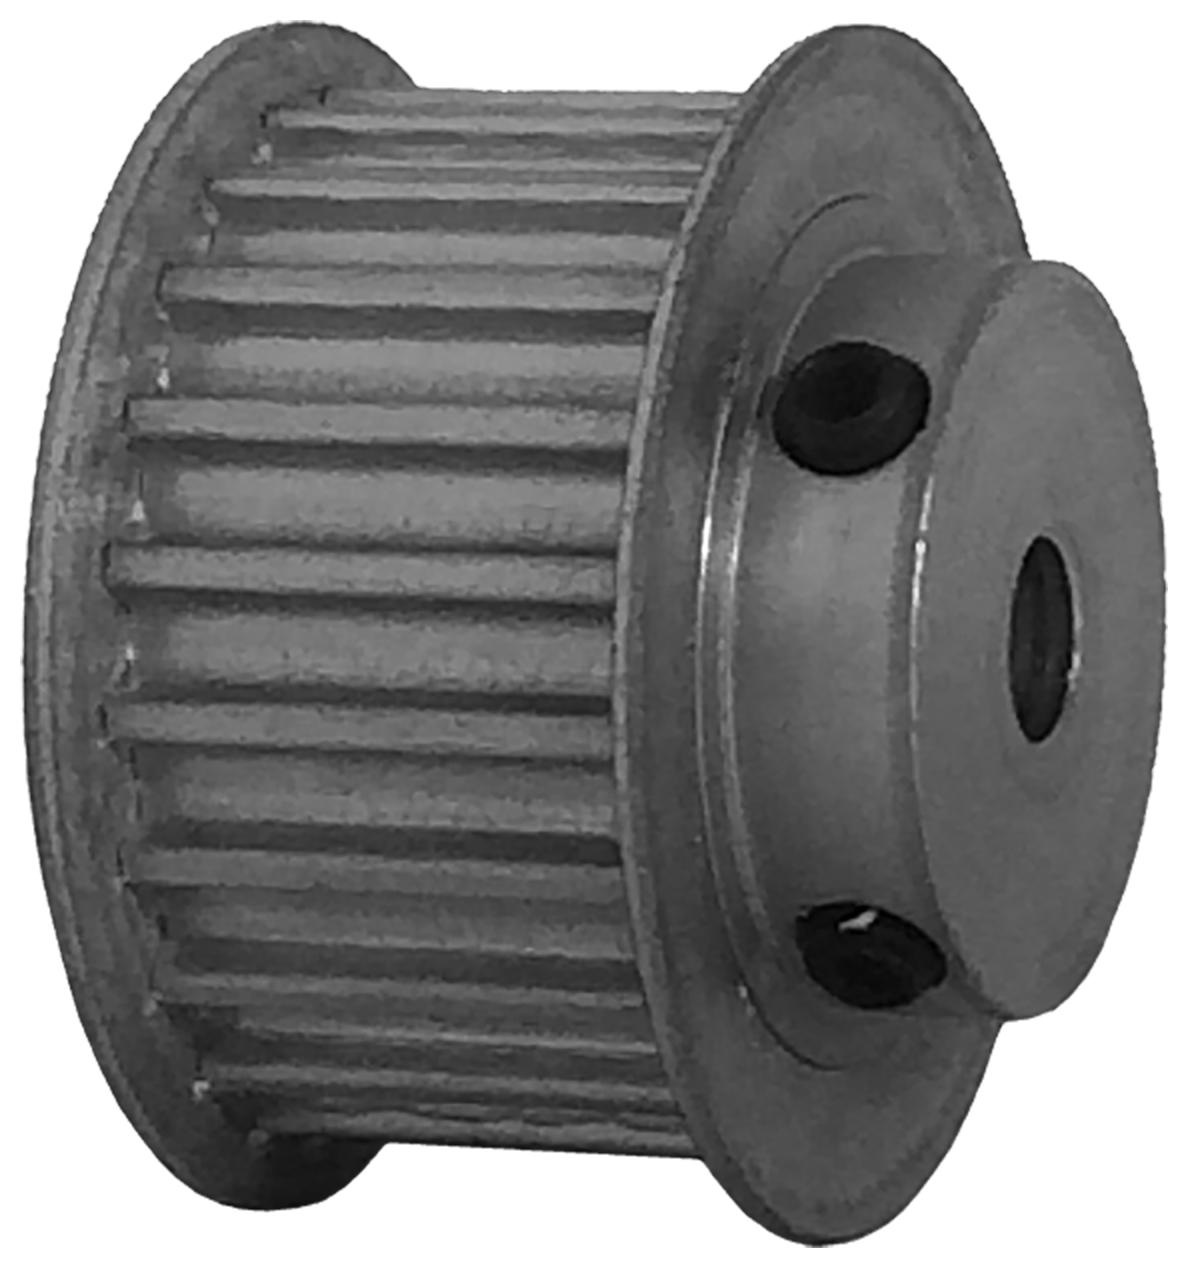 22-5M15-6FA3 - Aluminum Powerhouse®HTD® Pulleys